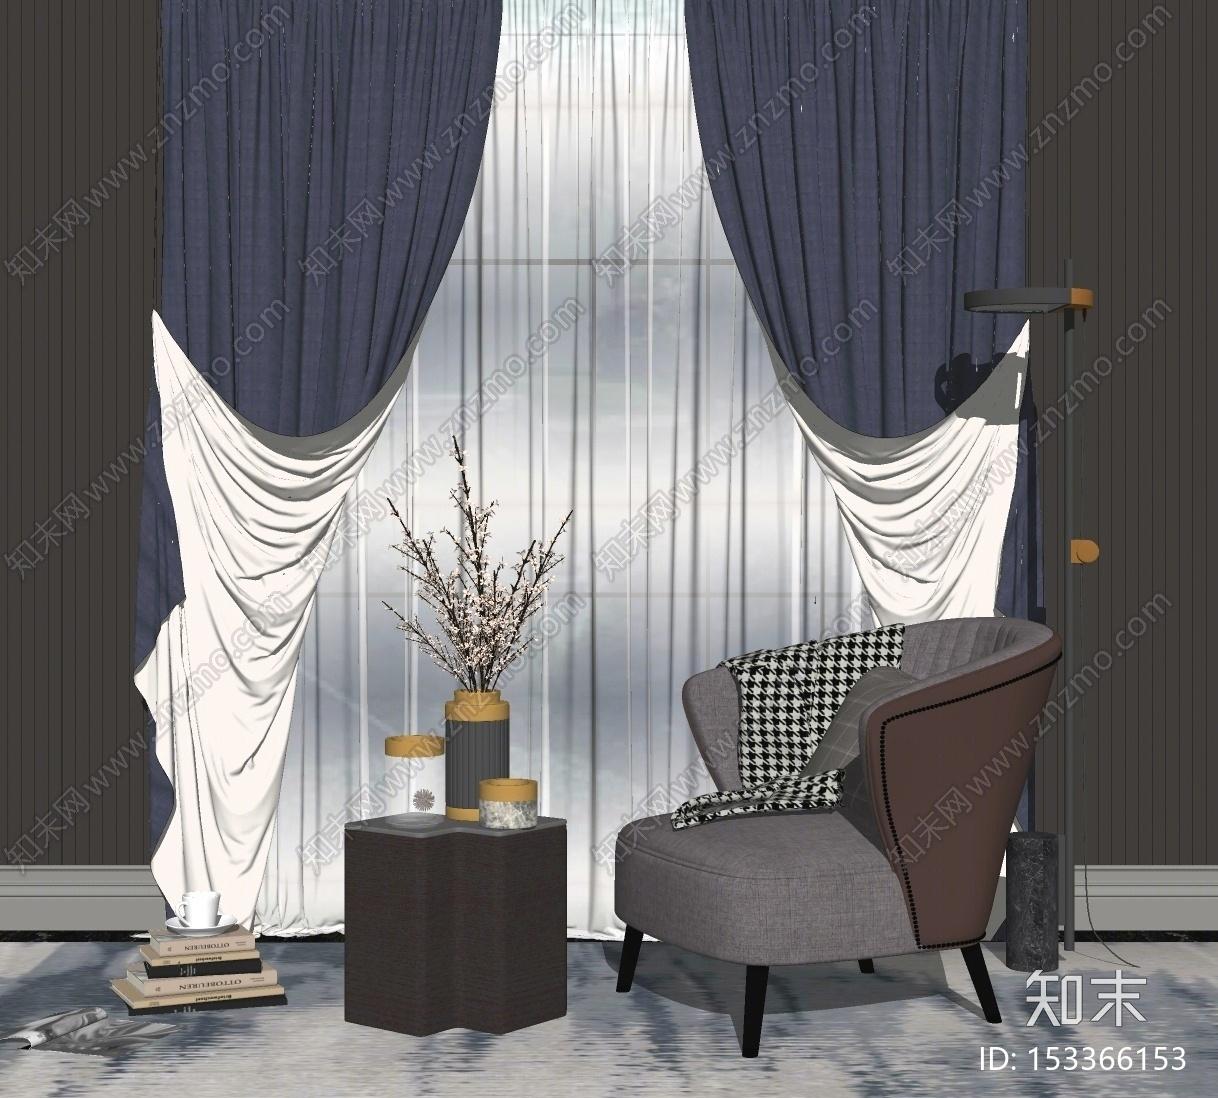 现代窗帘SU模型下载【ID:153366153】